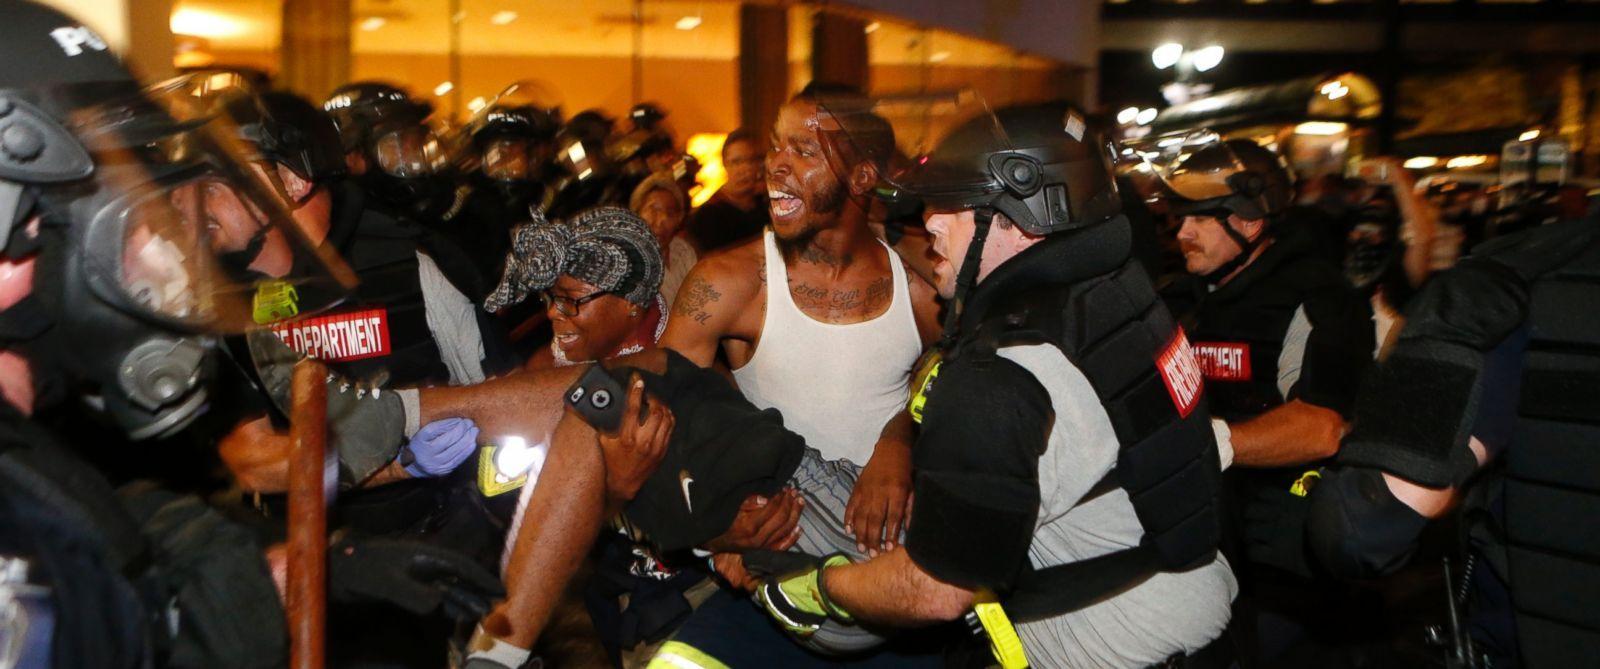 Manifestantes se enfrentan a la policía en Charlotte. Foto de ABC